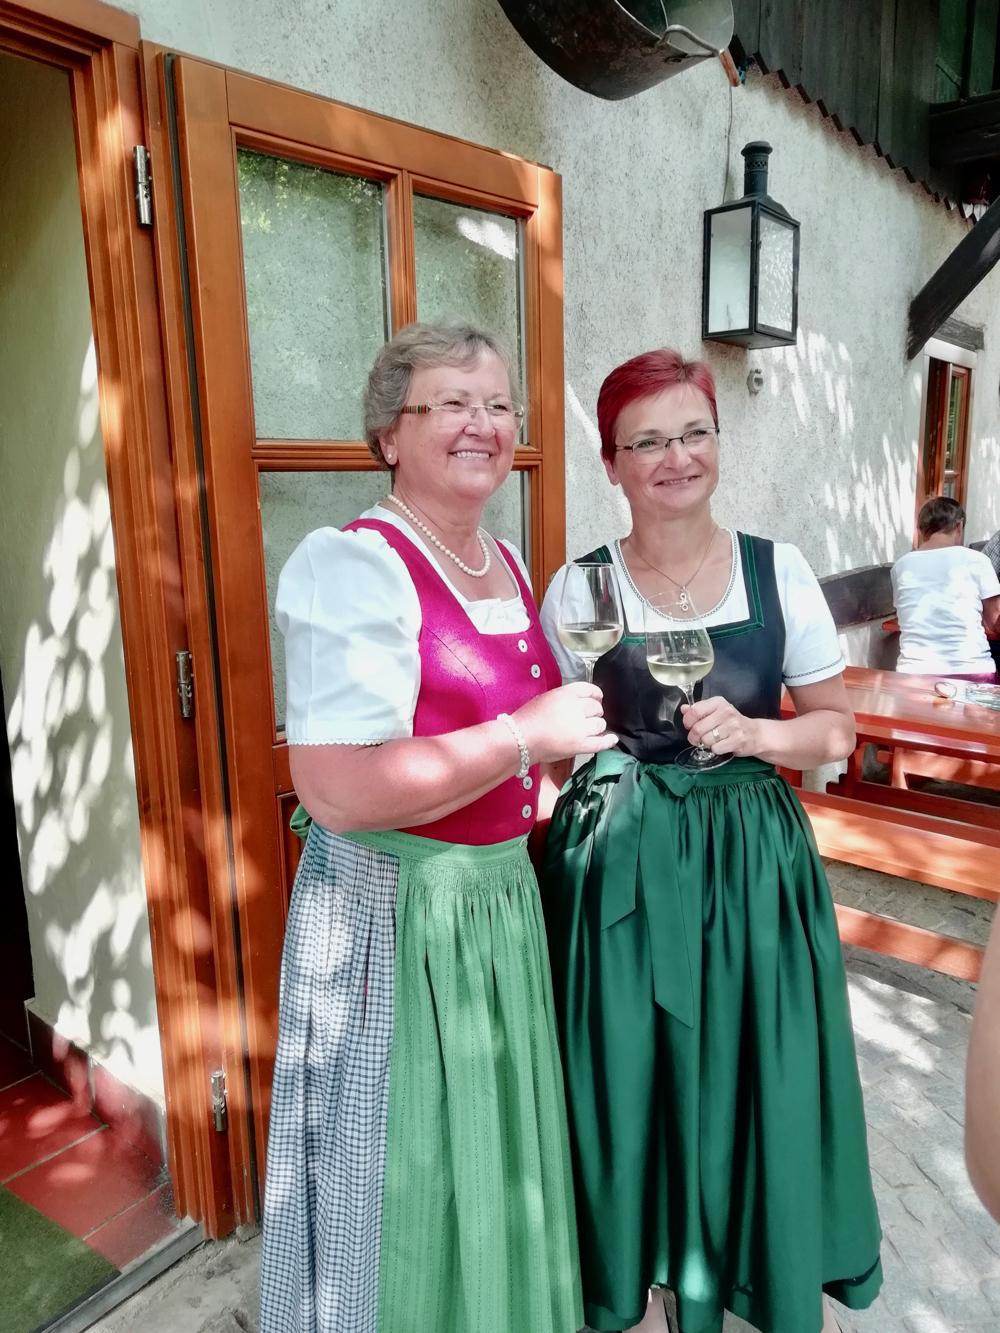 2 Oostenrijkse dames in dirndl